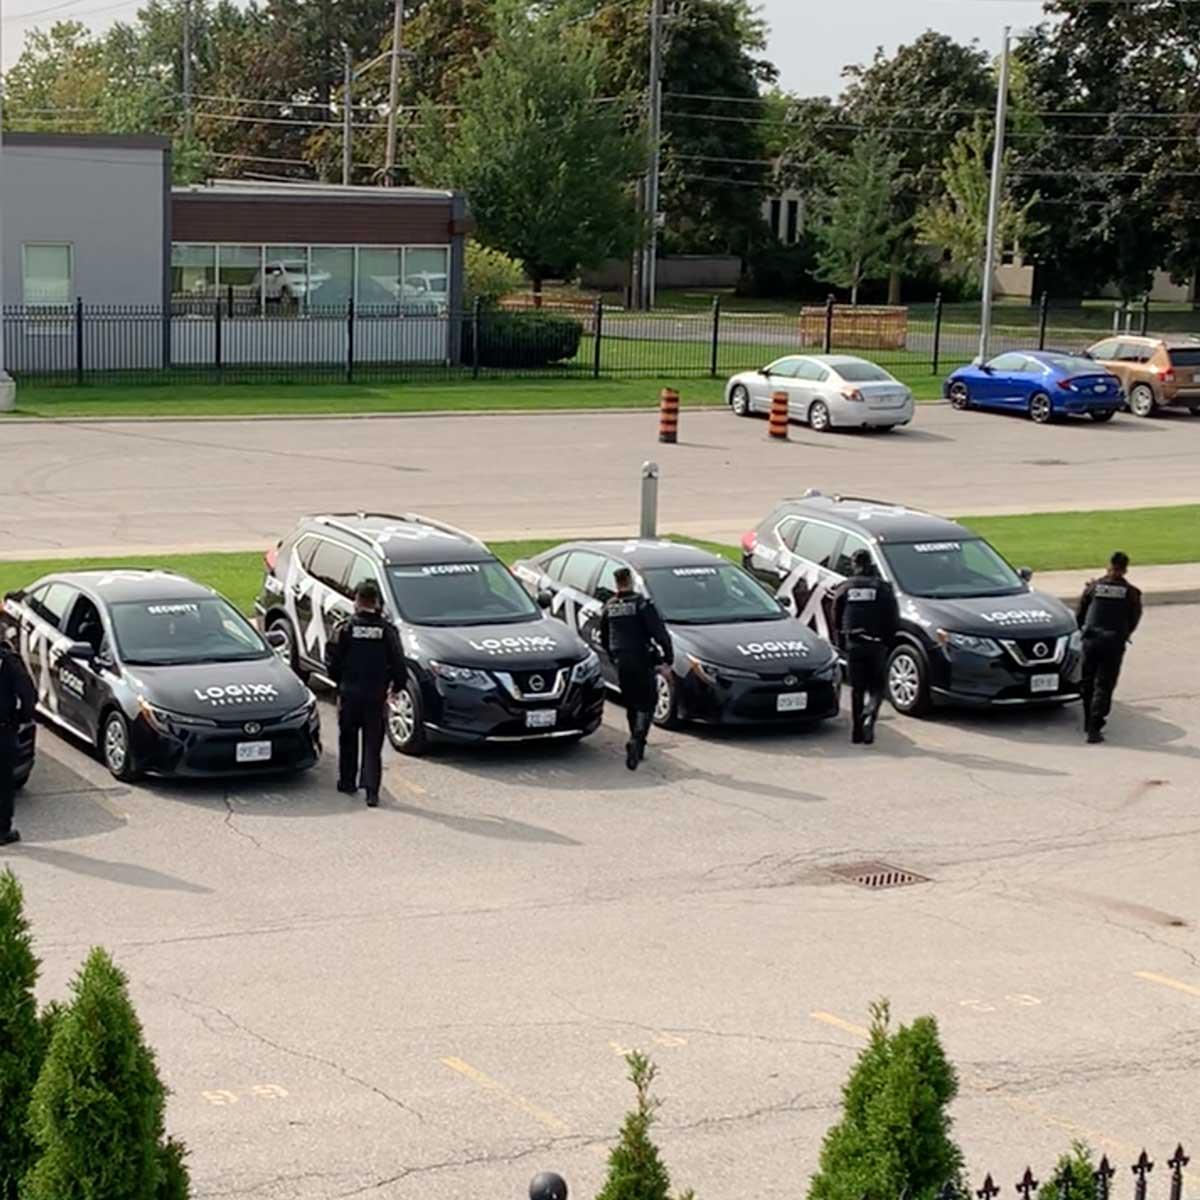 Mobile Patrol, Logixx Security